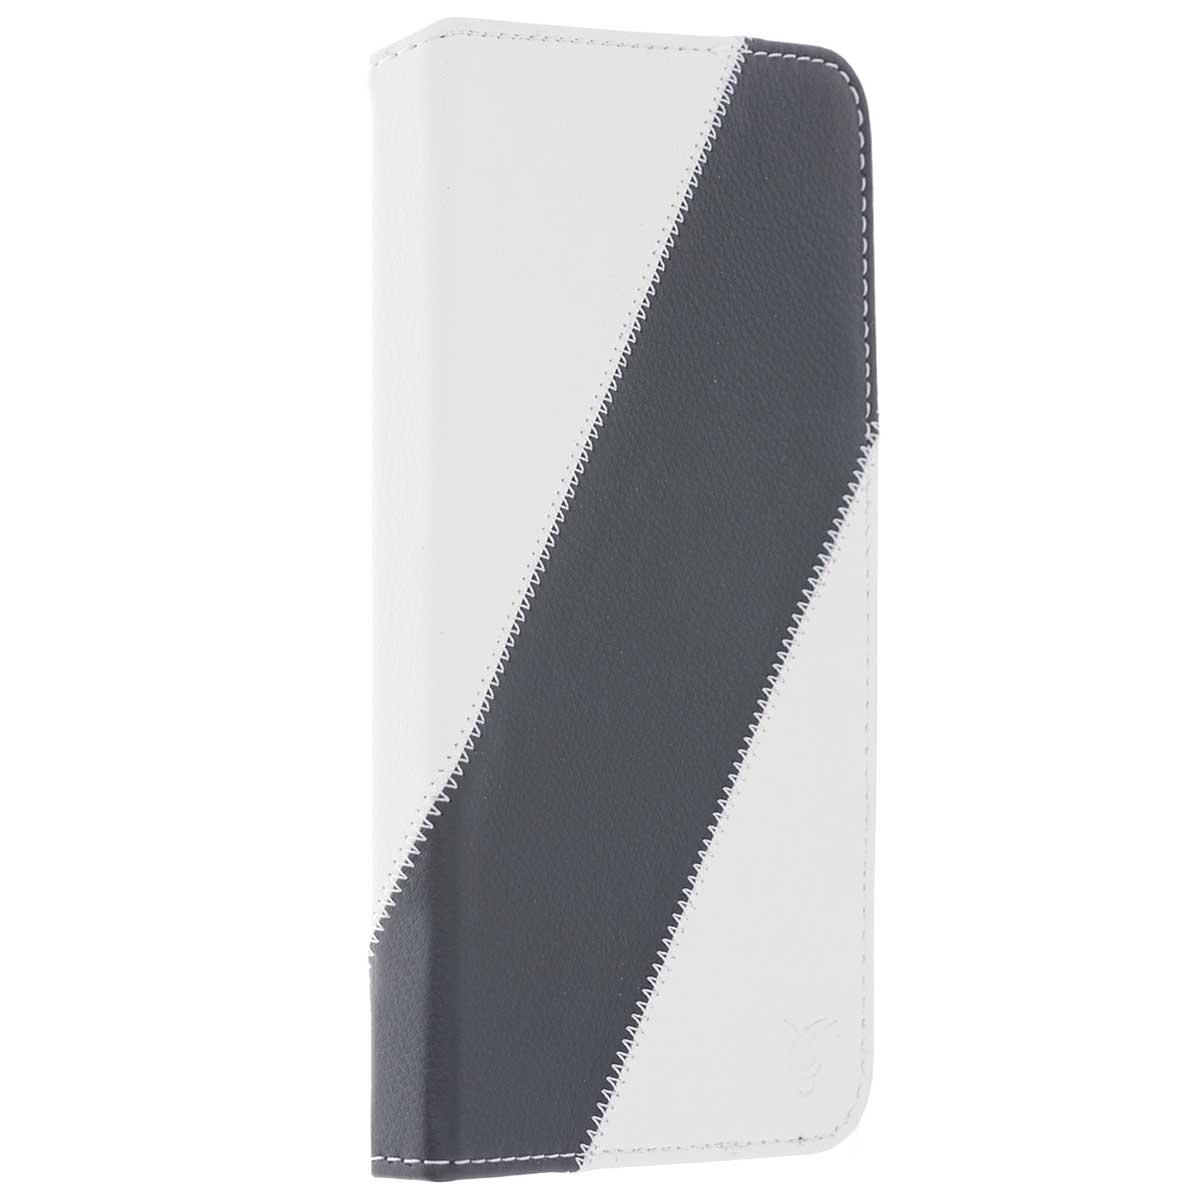 Vivacase Fantasy чехол для Asus MeMO Pad 7, White Black (VAS-ASMPF04-wb)